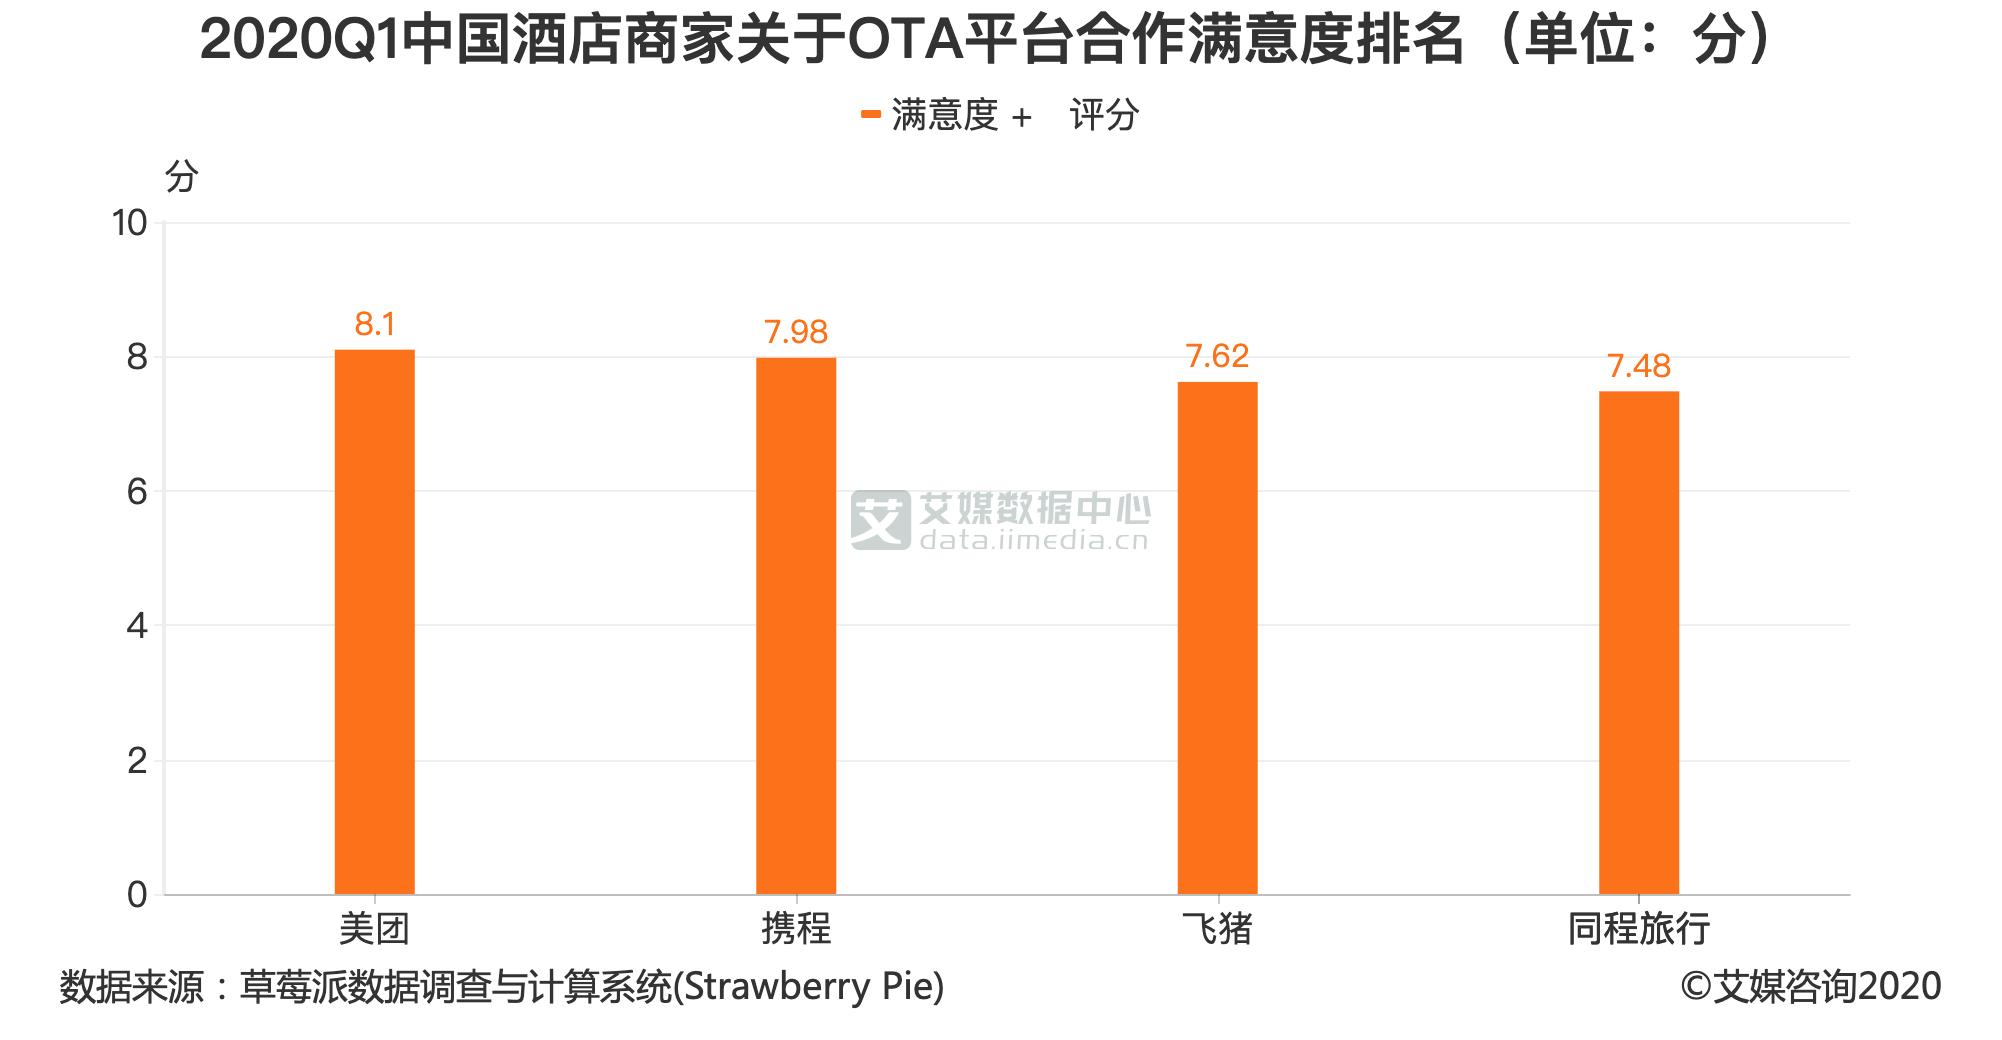 2020Q1中国酒店商家关于OTA平台合作满意度排名(单位:分)